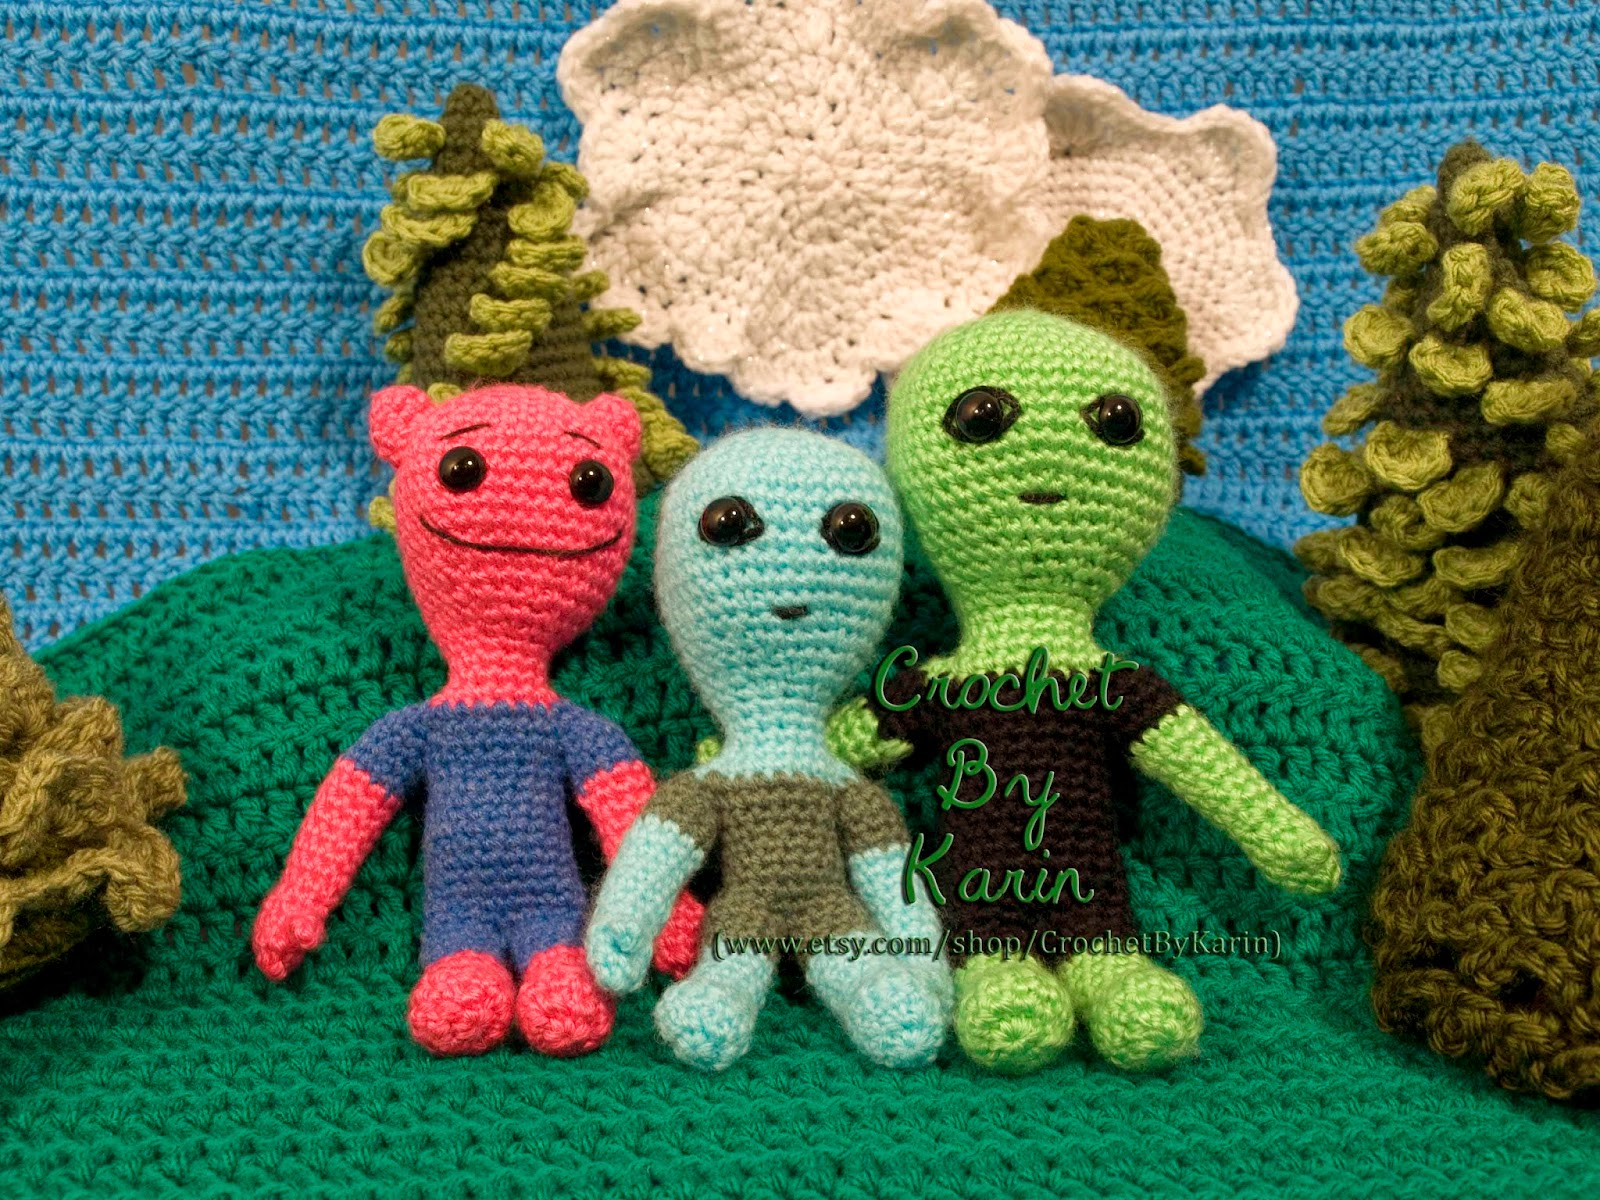 Crochet Amigurumi Alien : CrochetByKarin: Crochet Amigurumi Alien Pattern